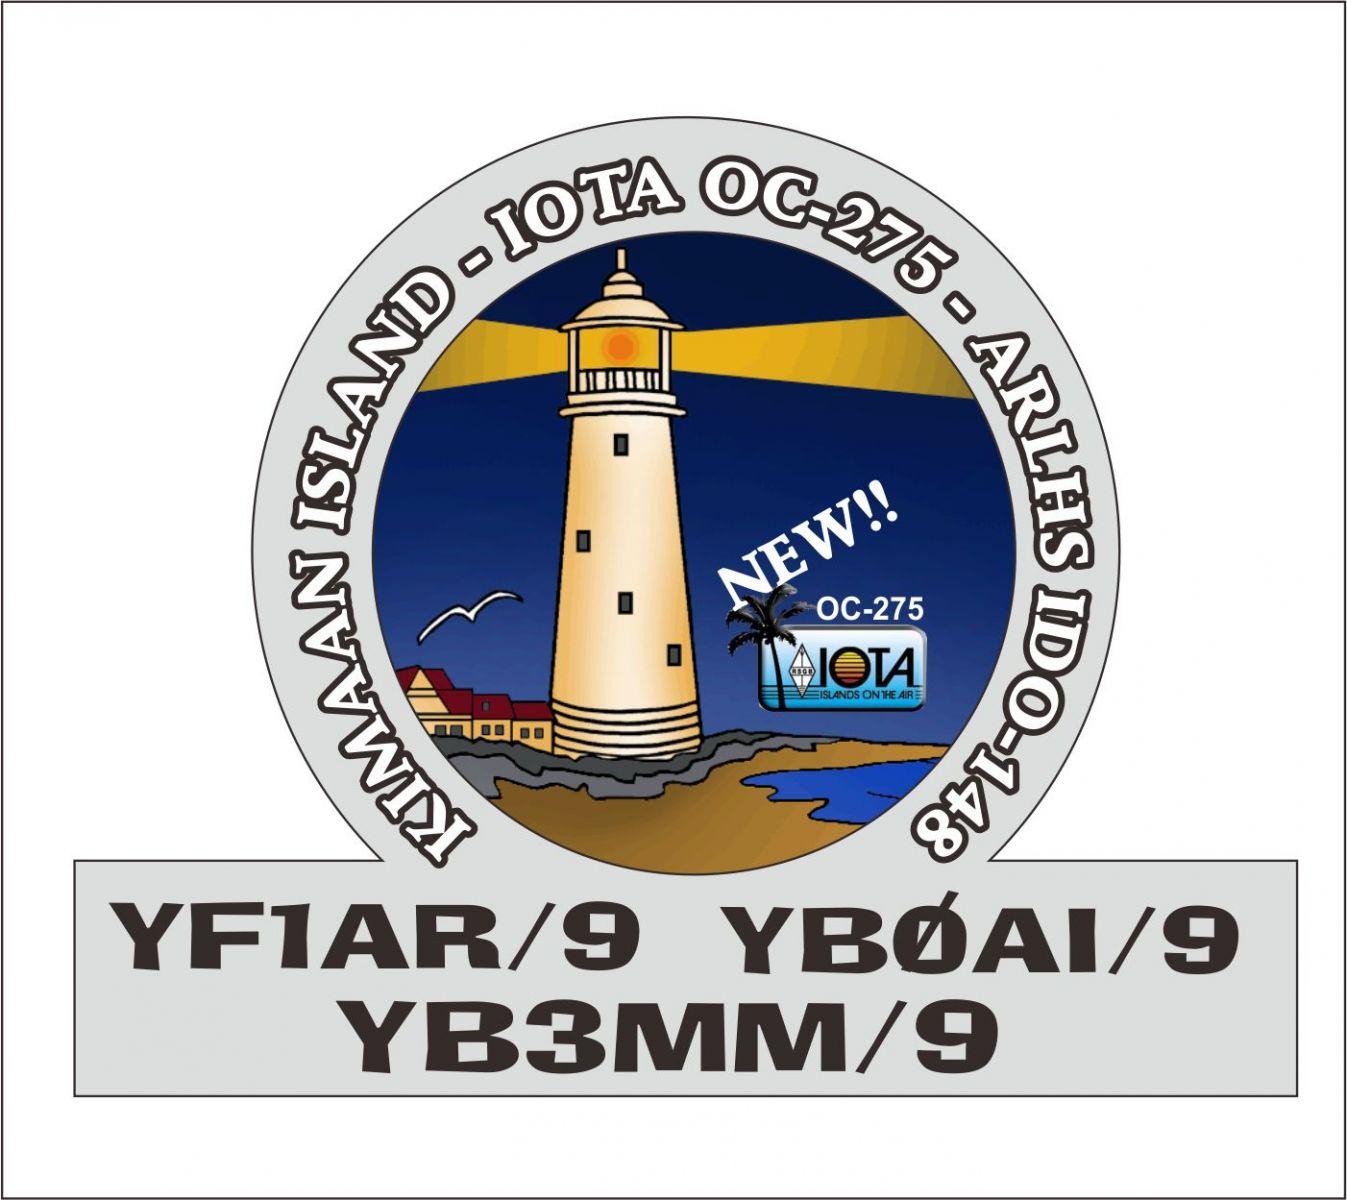 Kimaan Island YF1AR/9 YB0AI/9 YB3MM/9